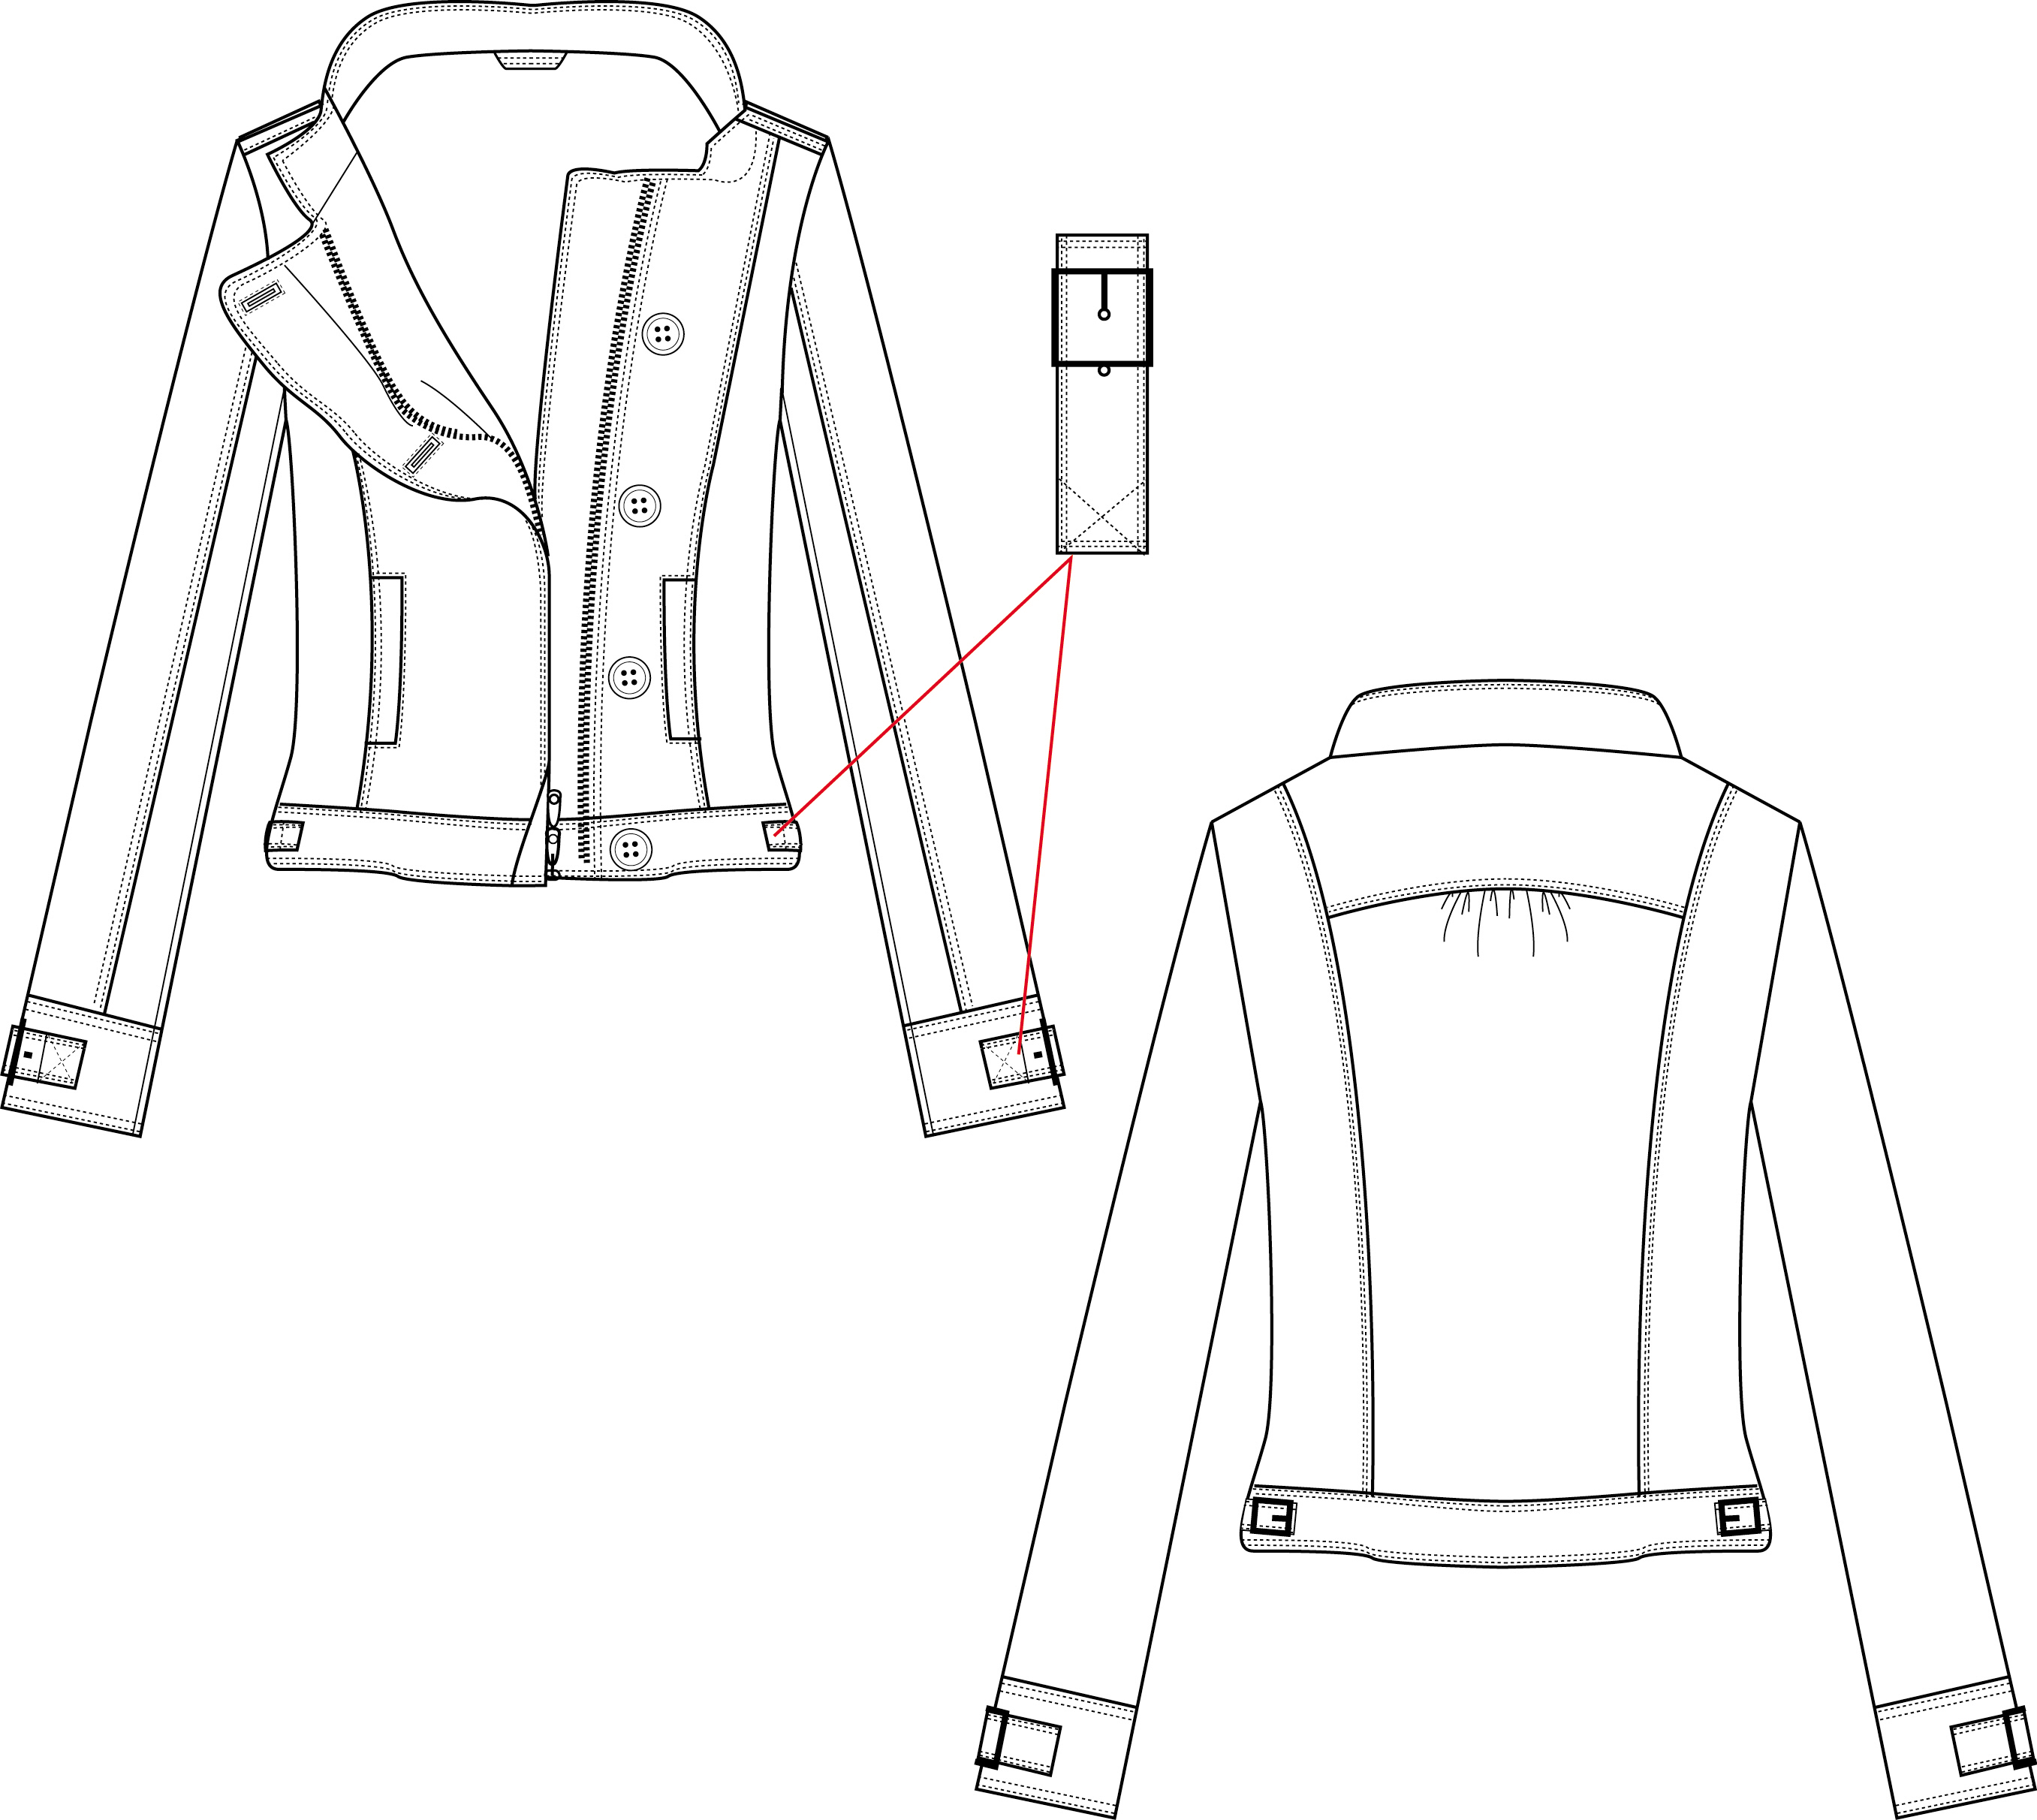 Fashion Cads Amp Technical Design By Lindsay T Dellinger At